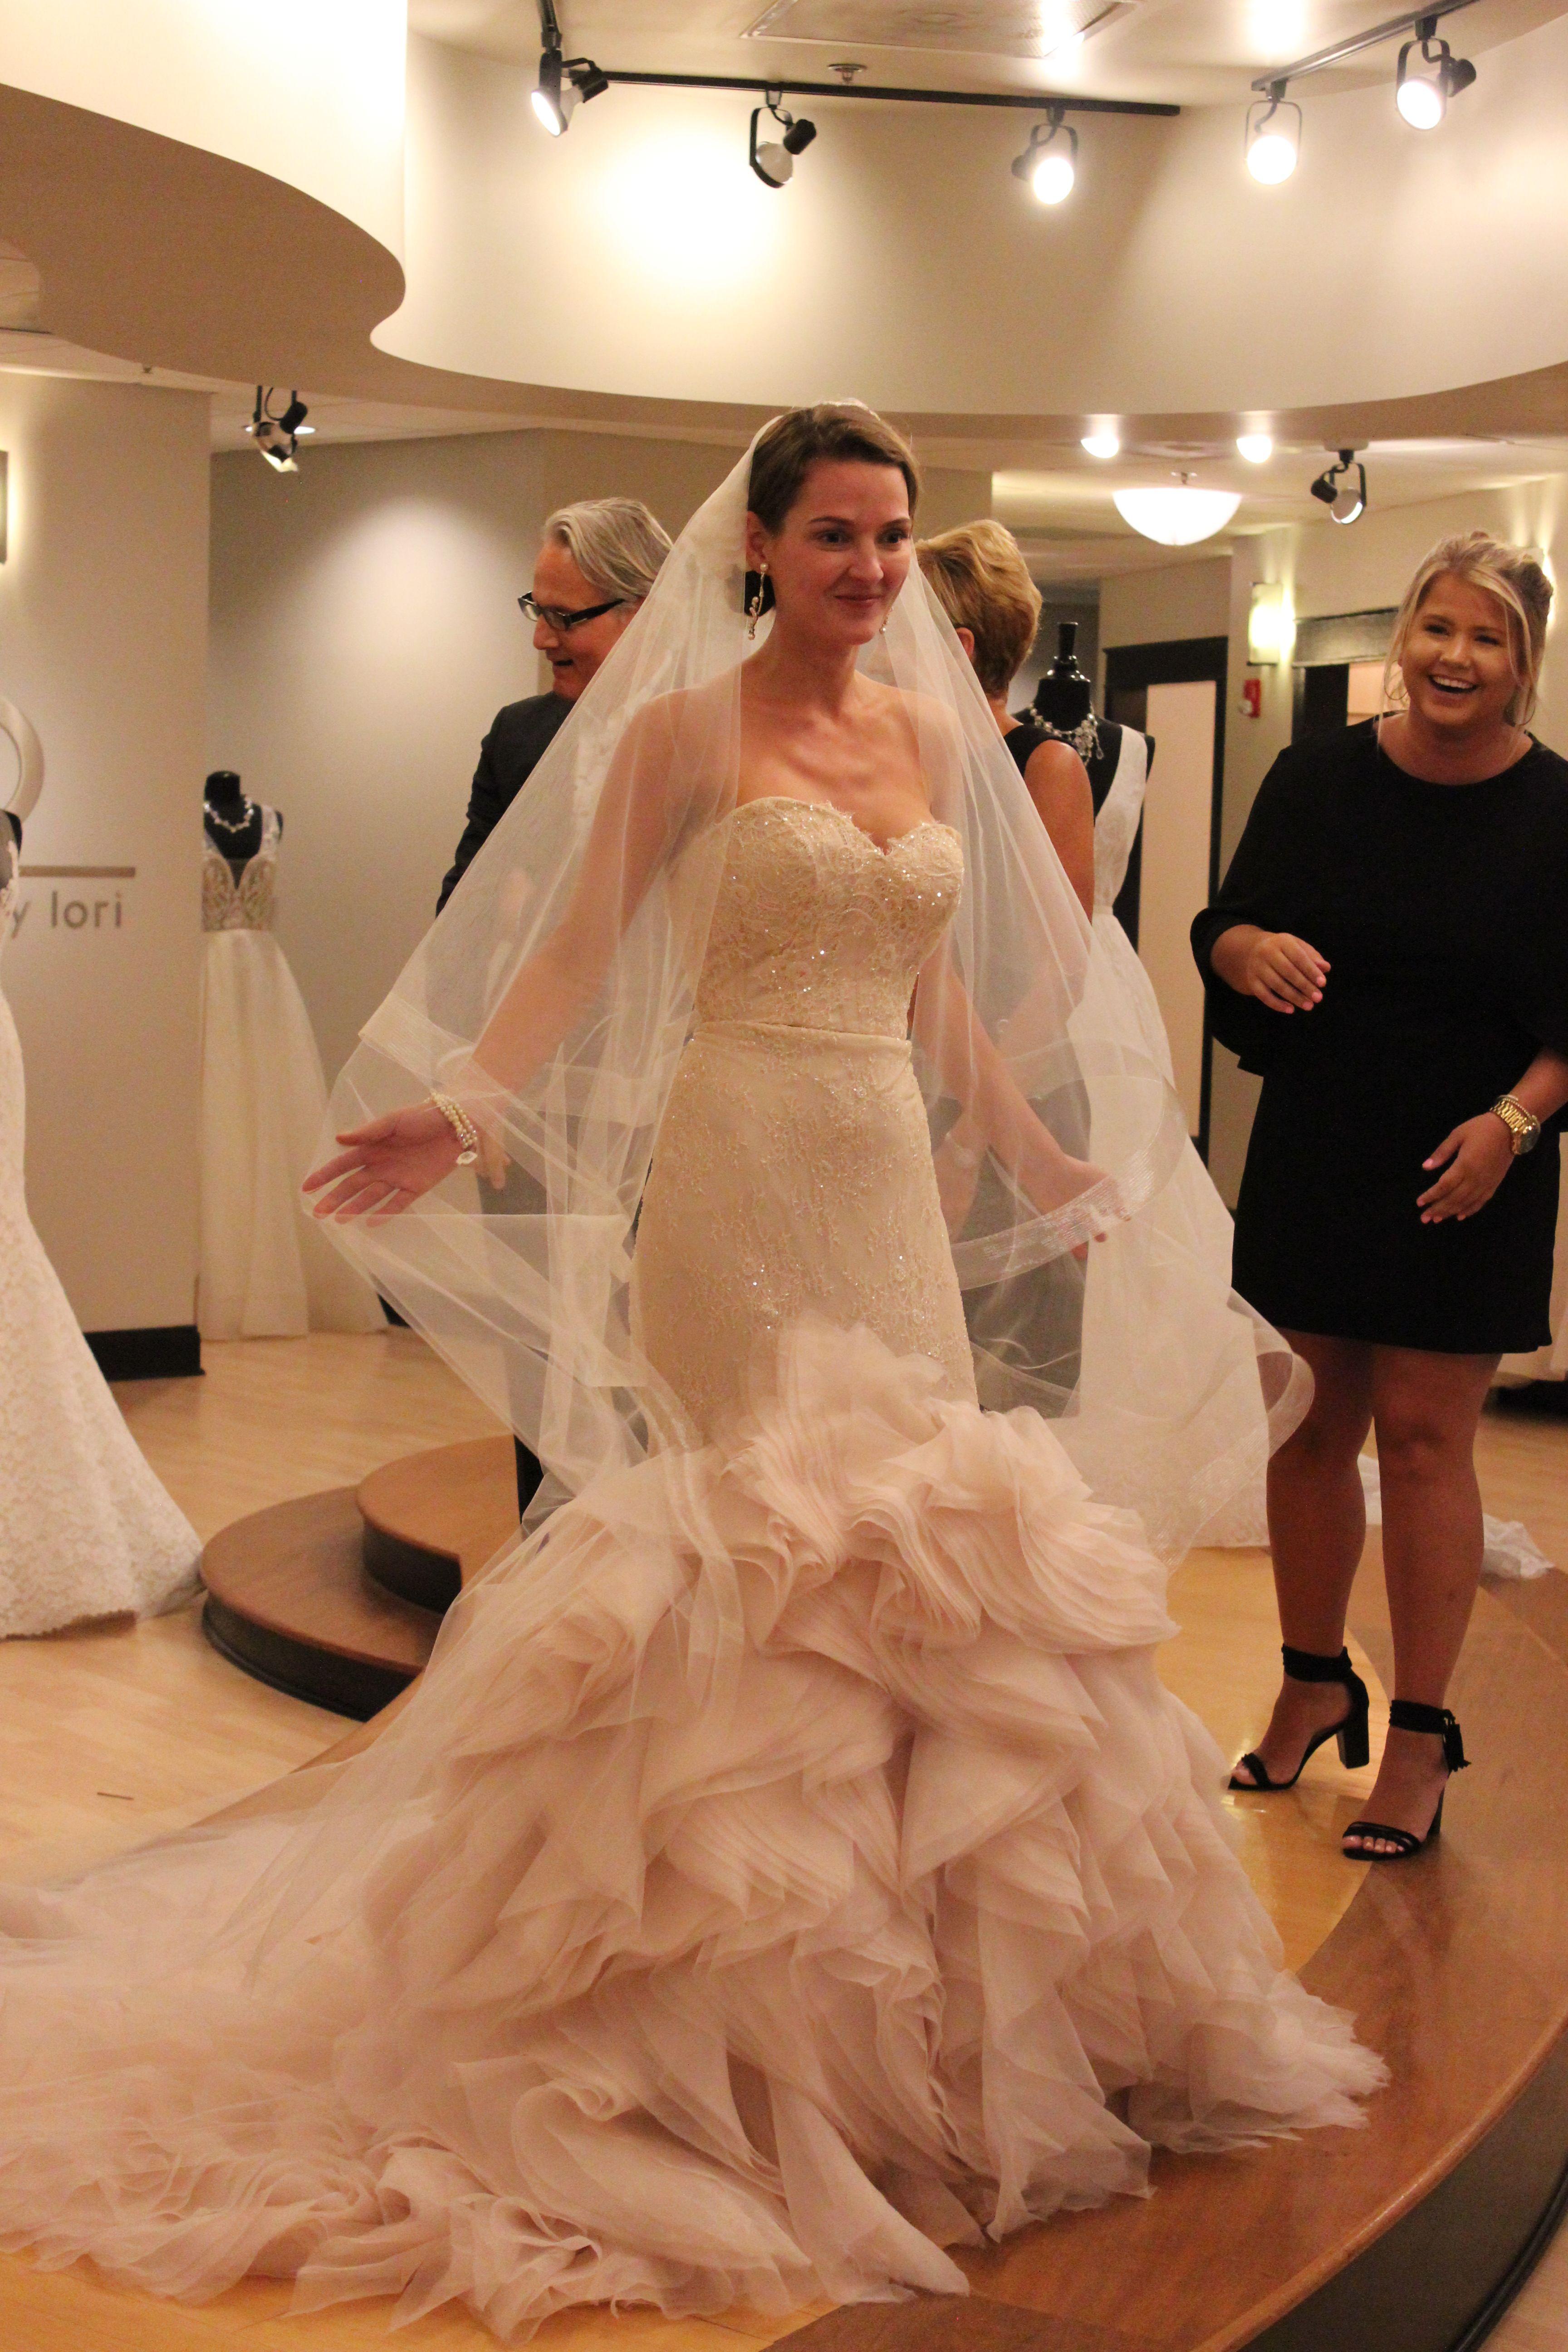 Bride Kandace Dalton Lazaro Strapless Sweetheart Neckline Mermaid Lace Bodice Tiered Lace Skirt 6 60 Bridal Gowns Dream Wedding Dresses Wedding Dresses [ 5184 x 3456 Pixel ]